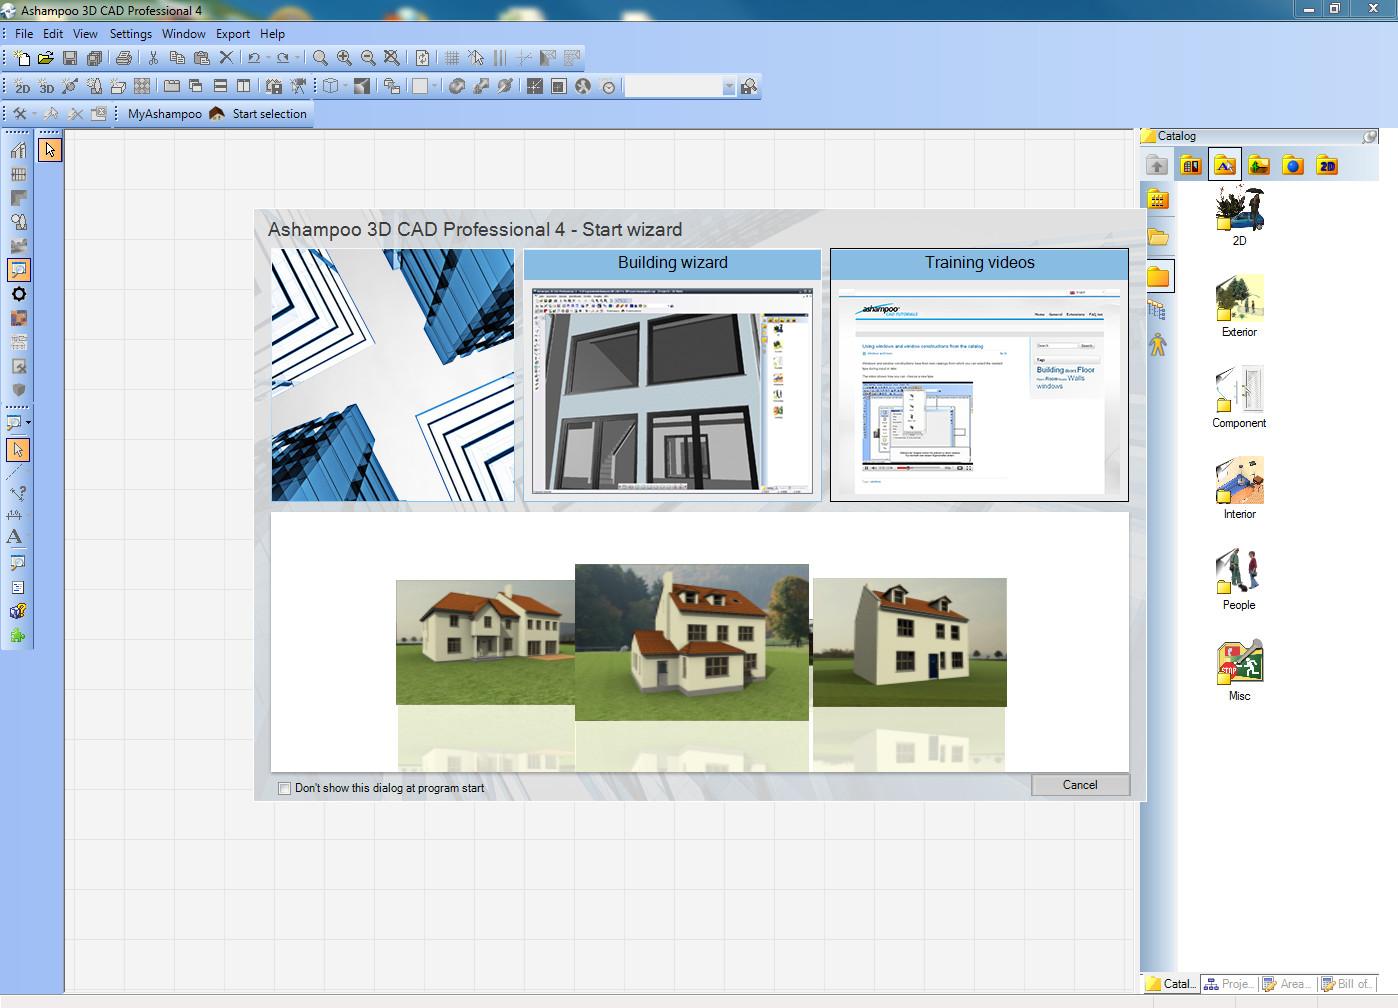 Ashampoo 3D CAD Professional 4 v4.0.1.9-LAXiTY(13-Oct)